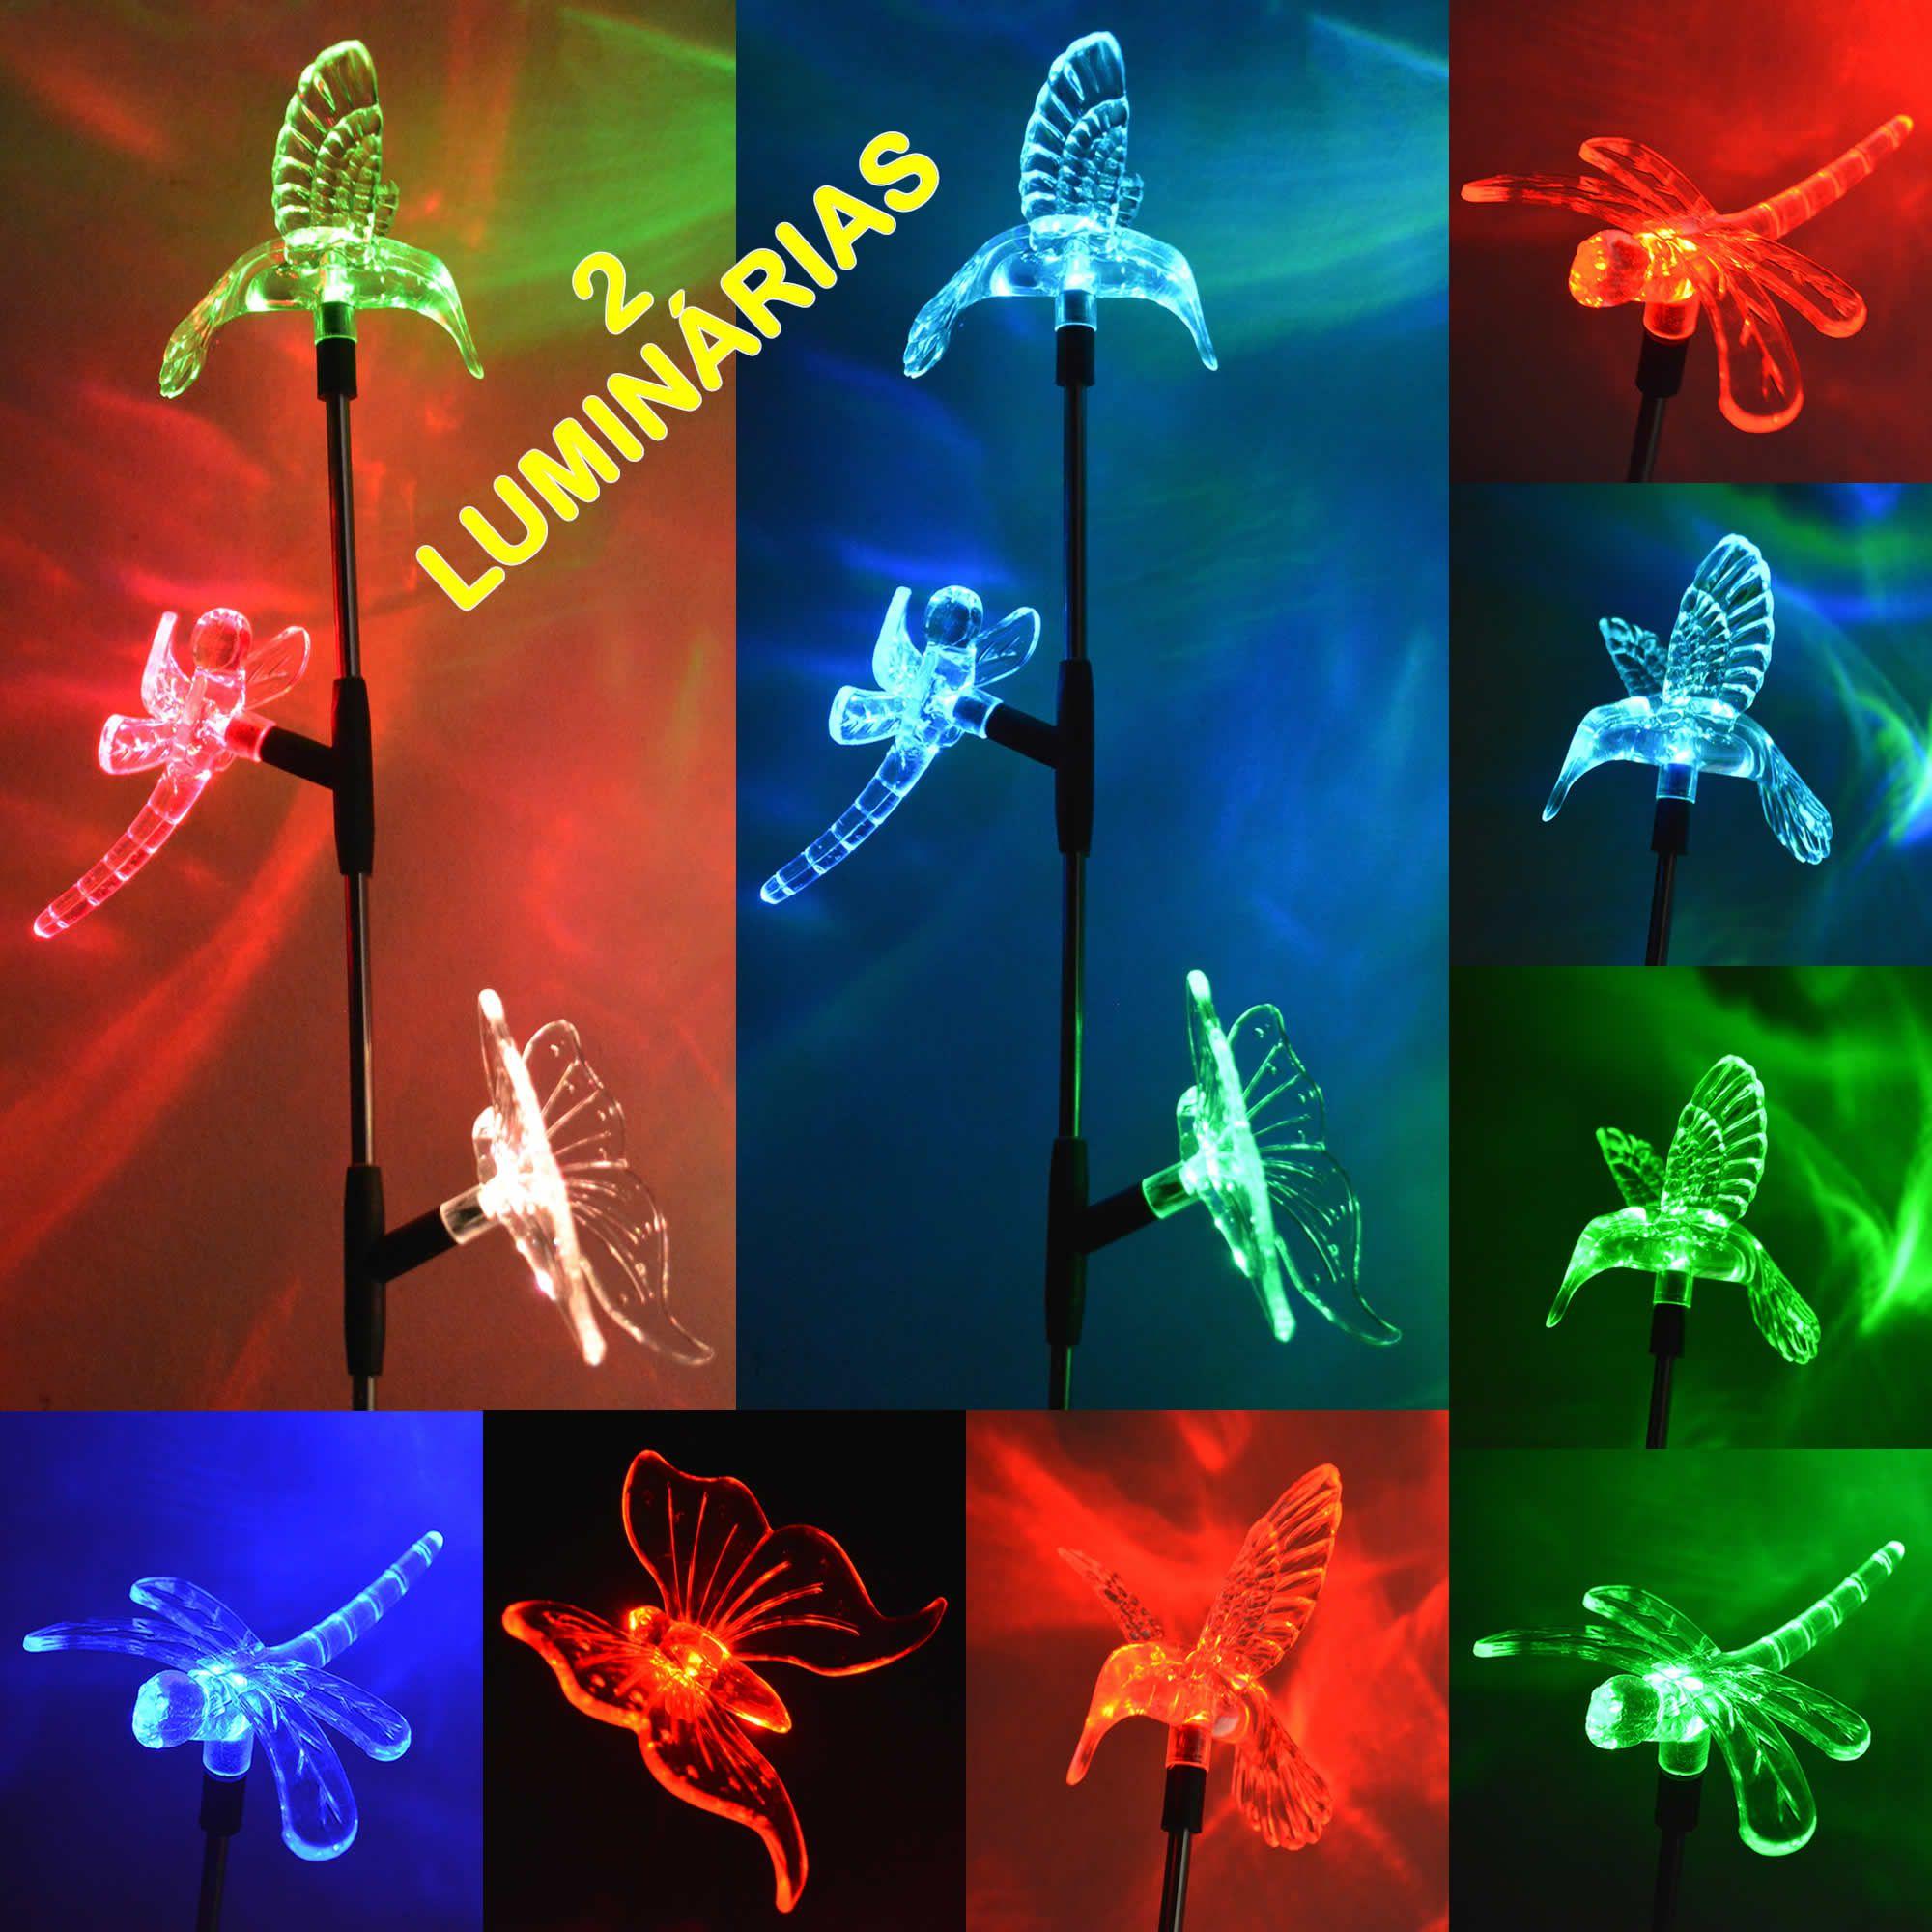 Luminária Solar Beija-flor Borboleta e Libélula 2 Peças CBRN13005